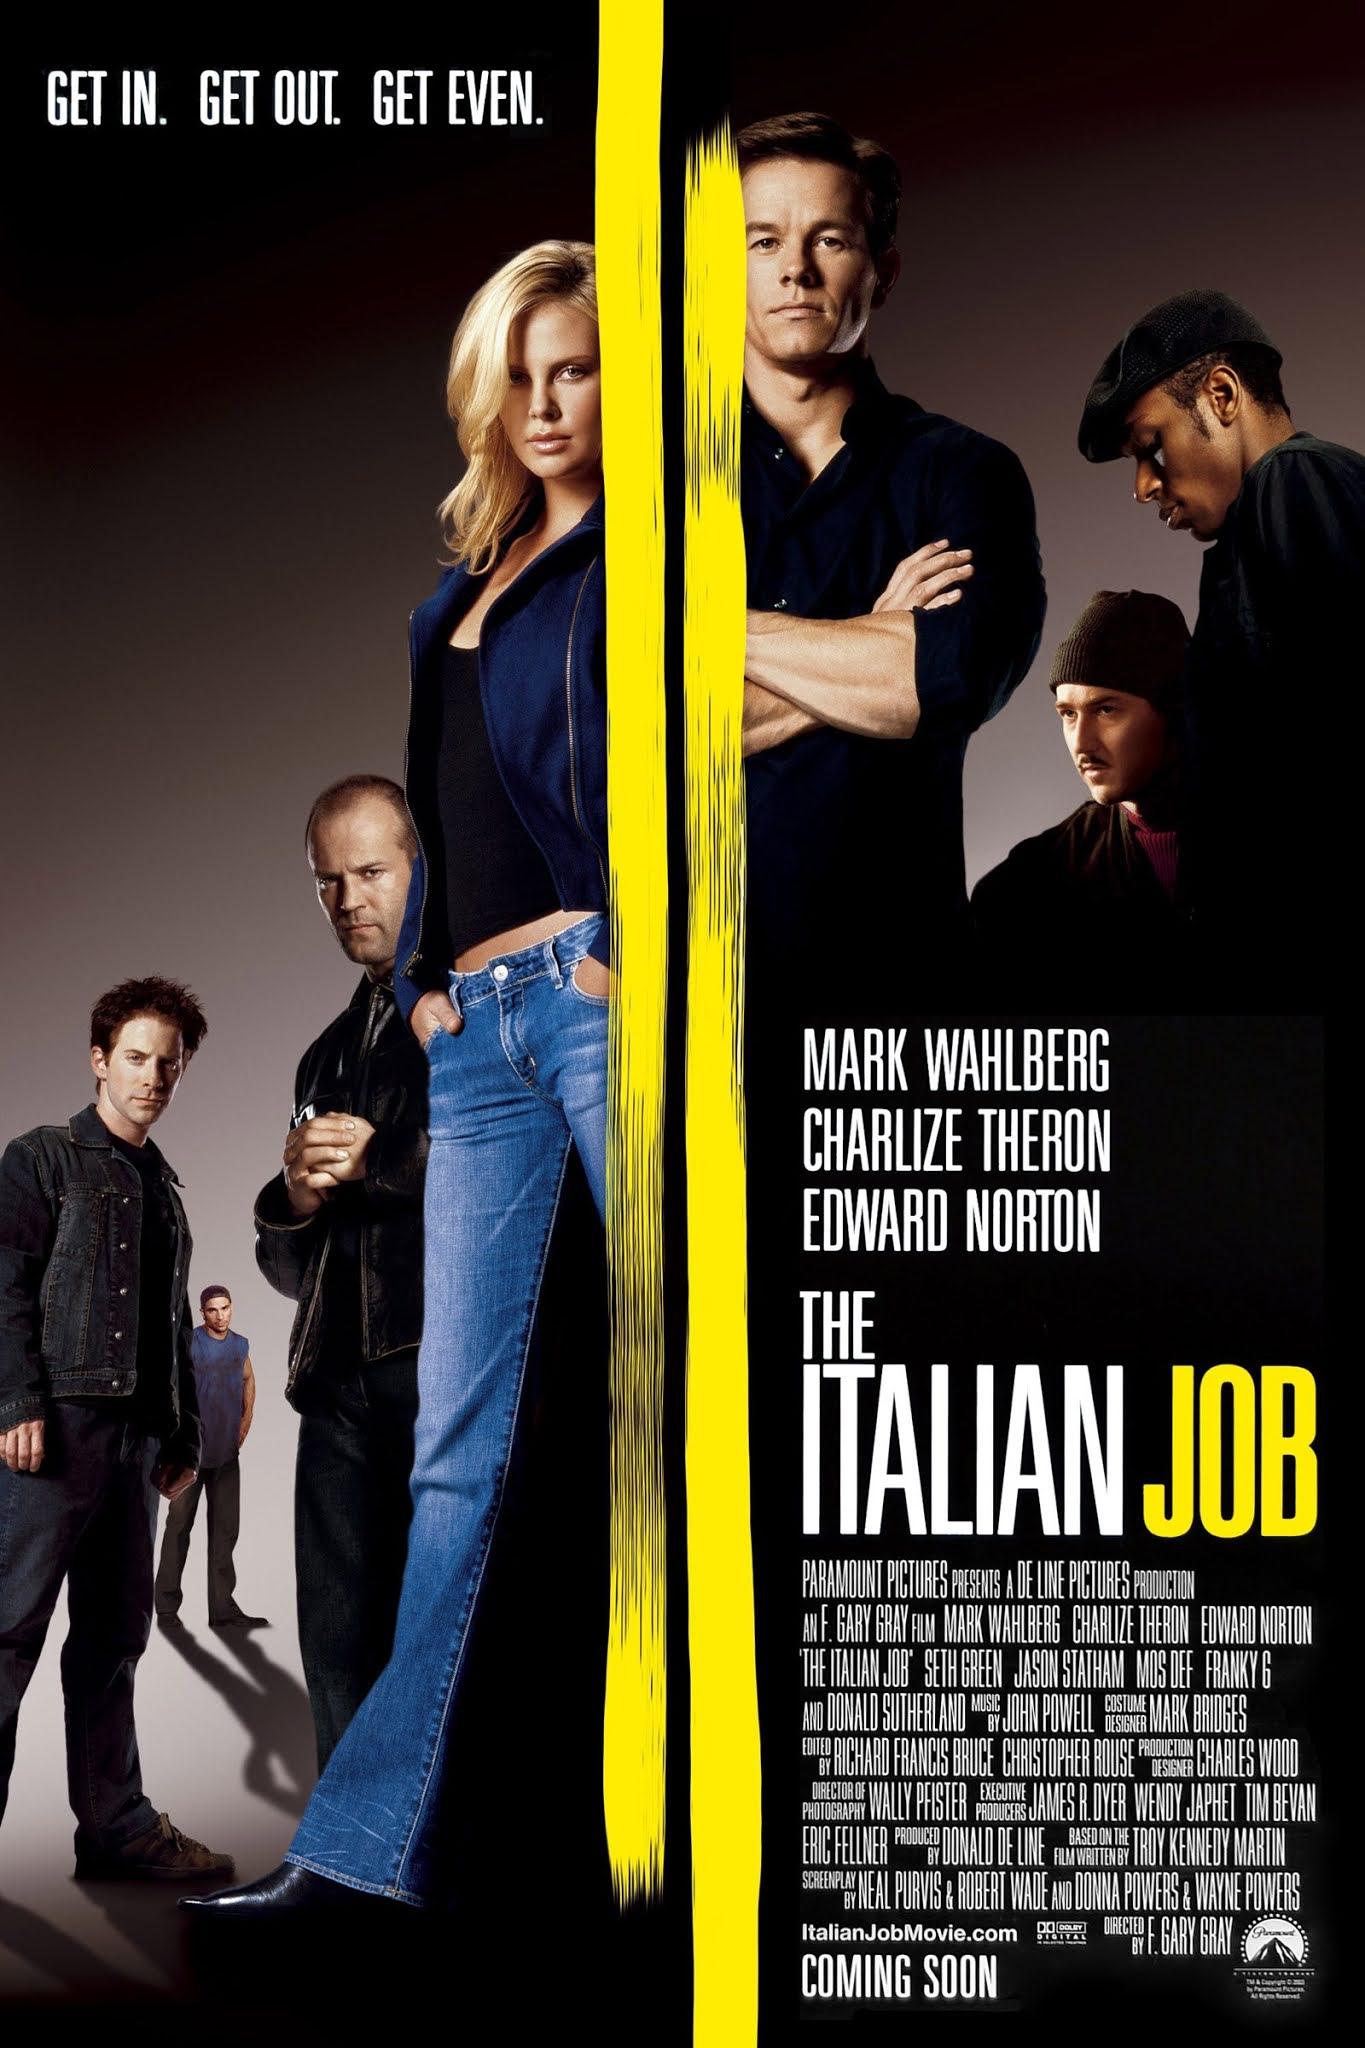 The Italian Job 2003